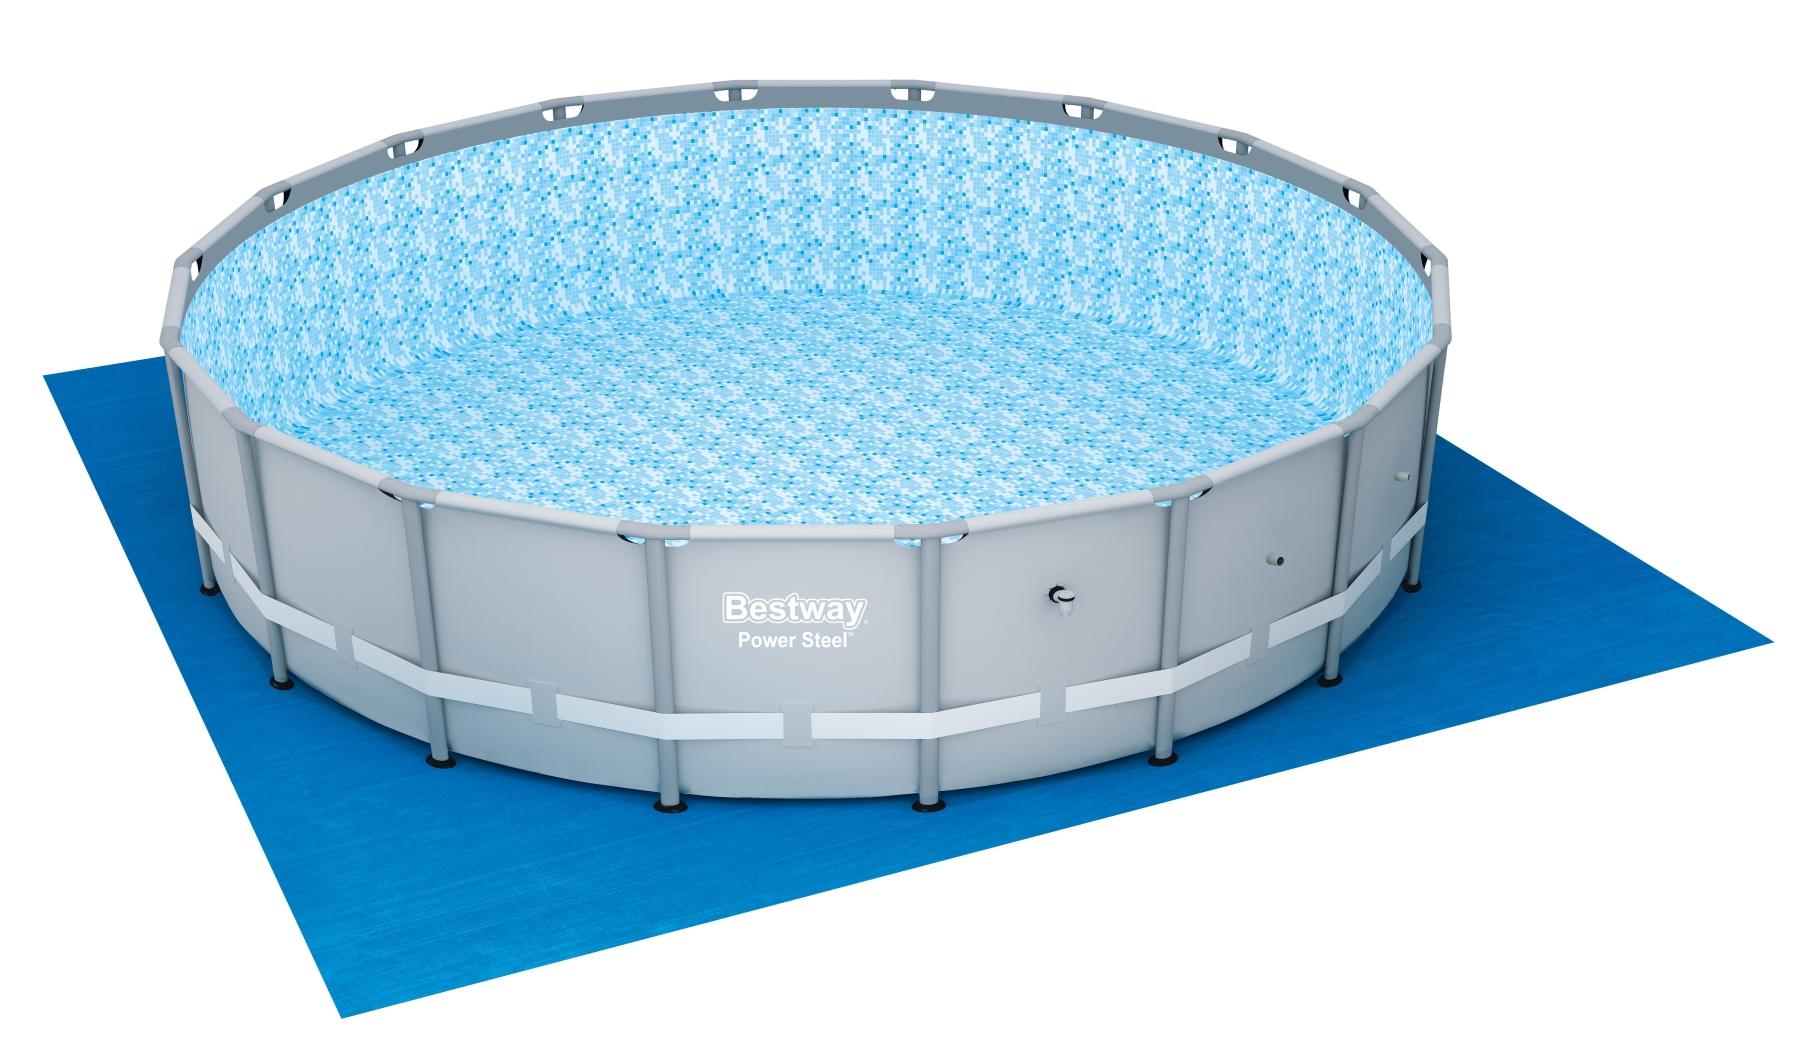 Piscina fuori terra rotonda bestway 56464 cm 549 x 132 for Accessori piscine fuori terra bestway